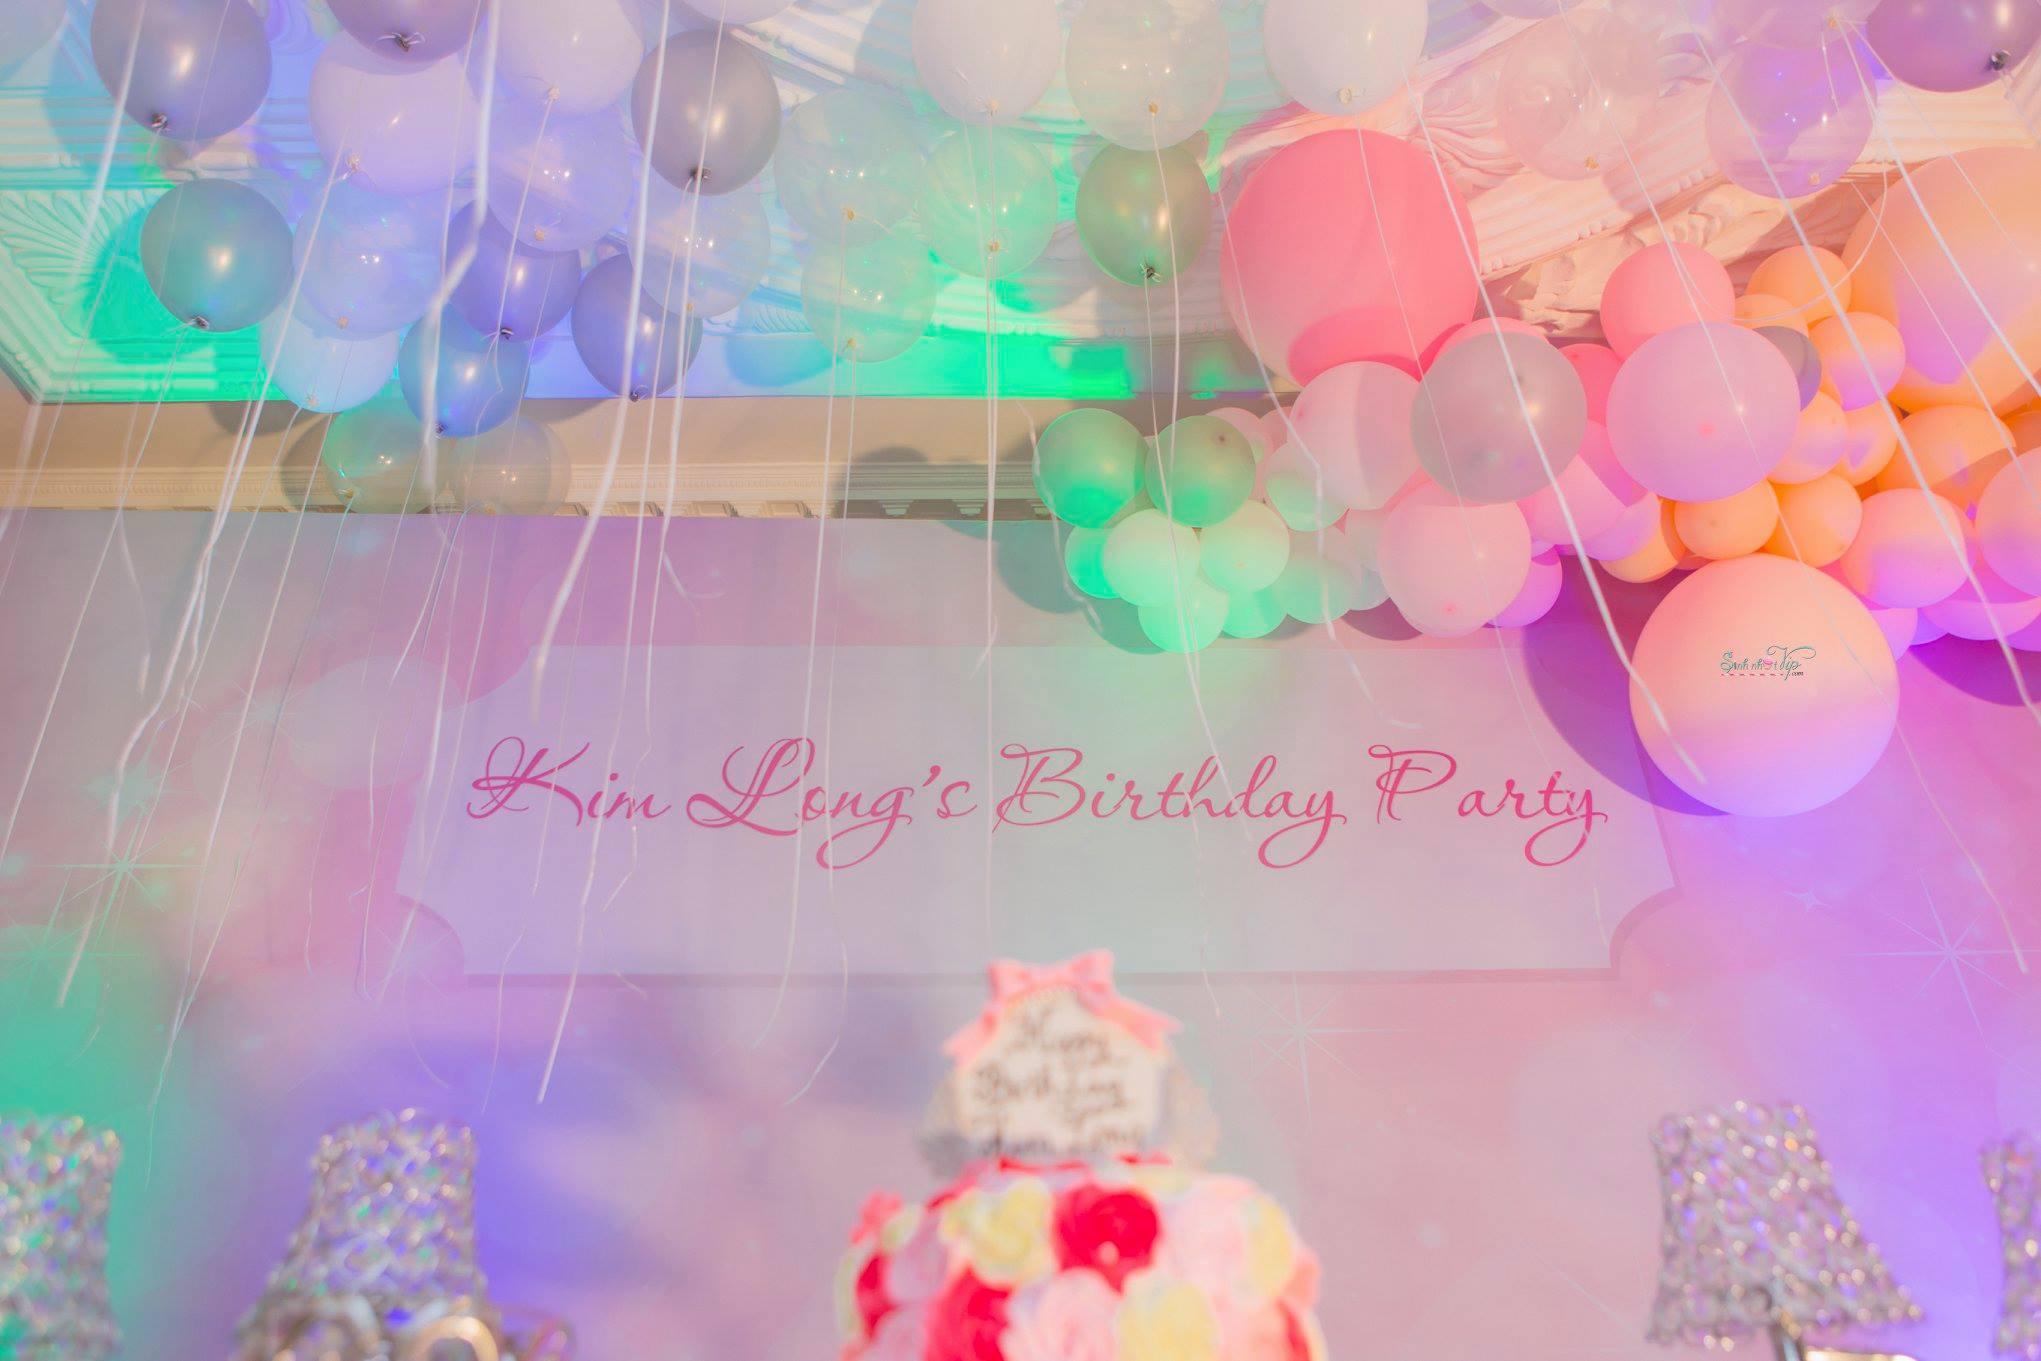 KIM LONG'S BIRTHDAY PARTY